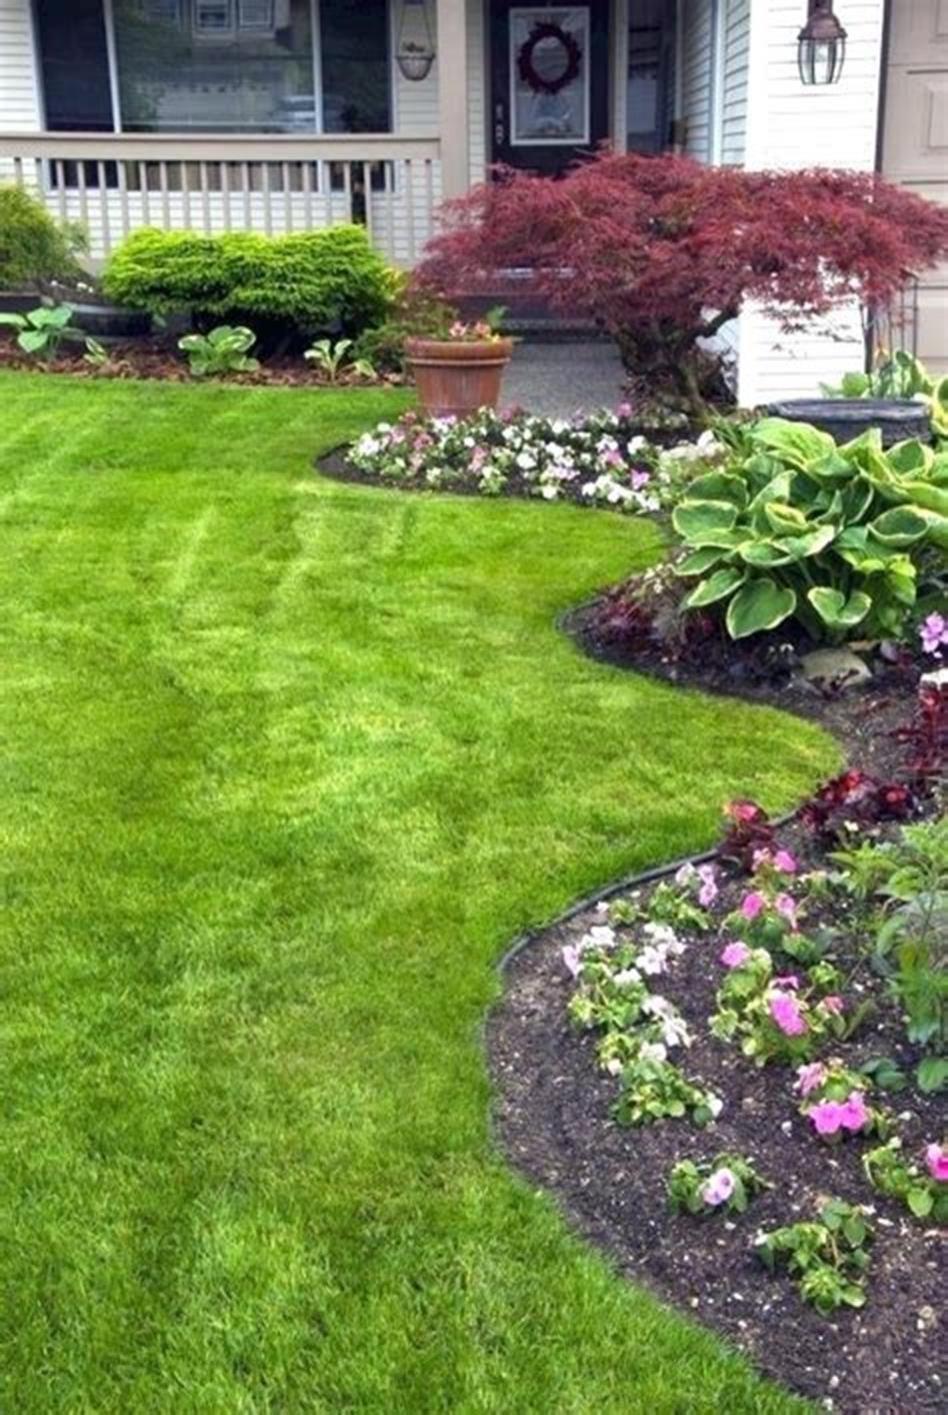 10 Best Front Yard Landscaping Ideas Low Maintenance | Diy ...